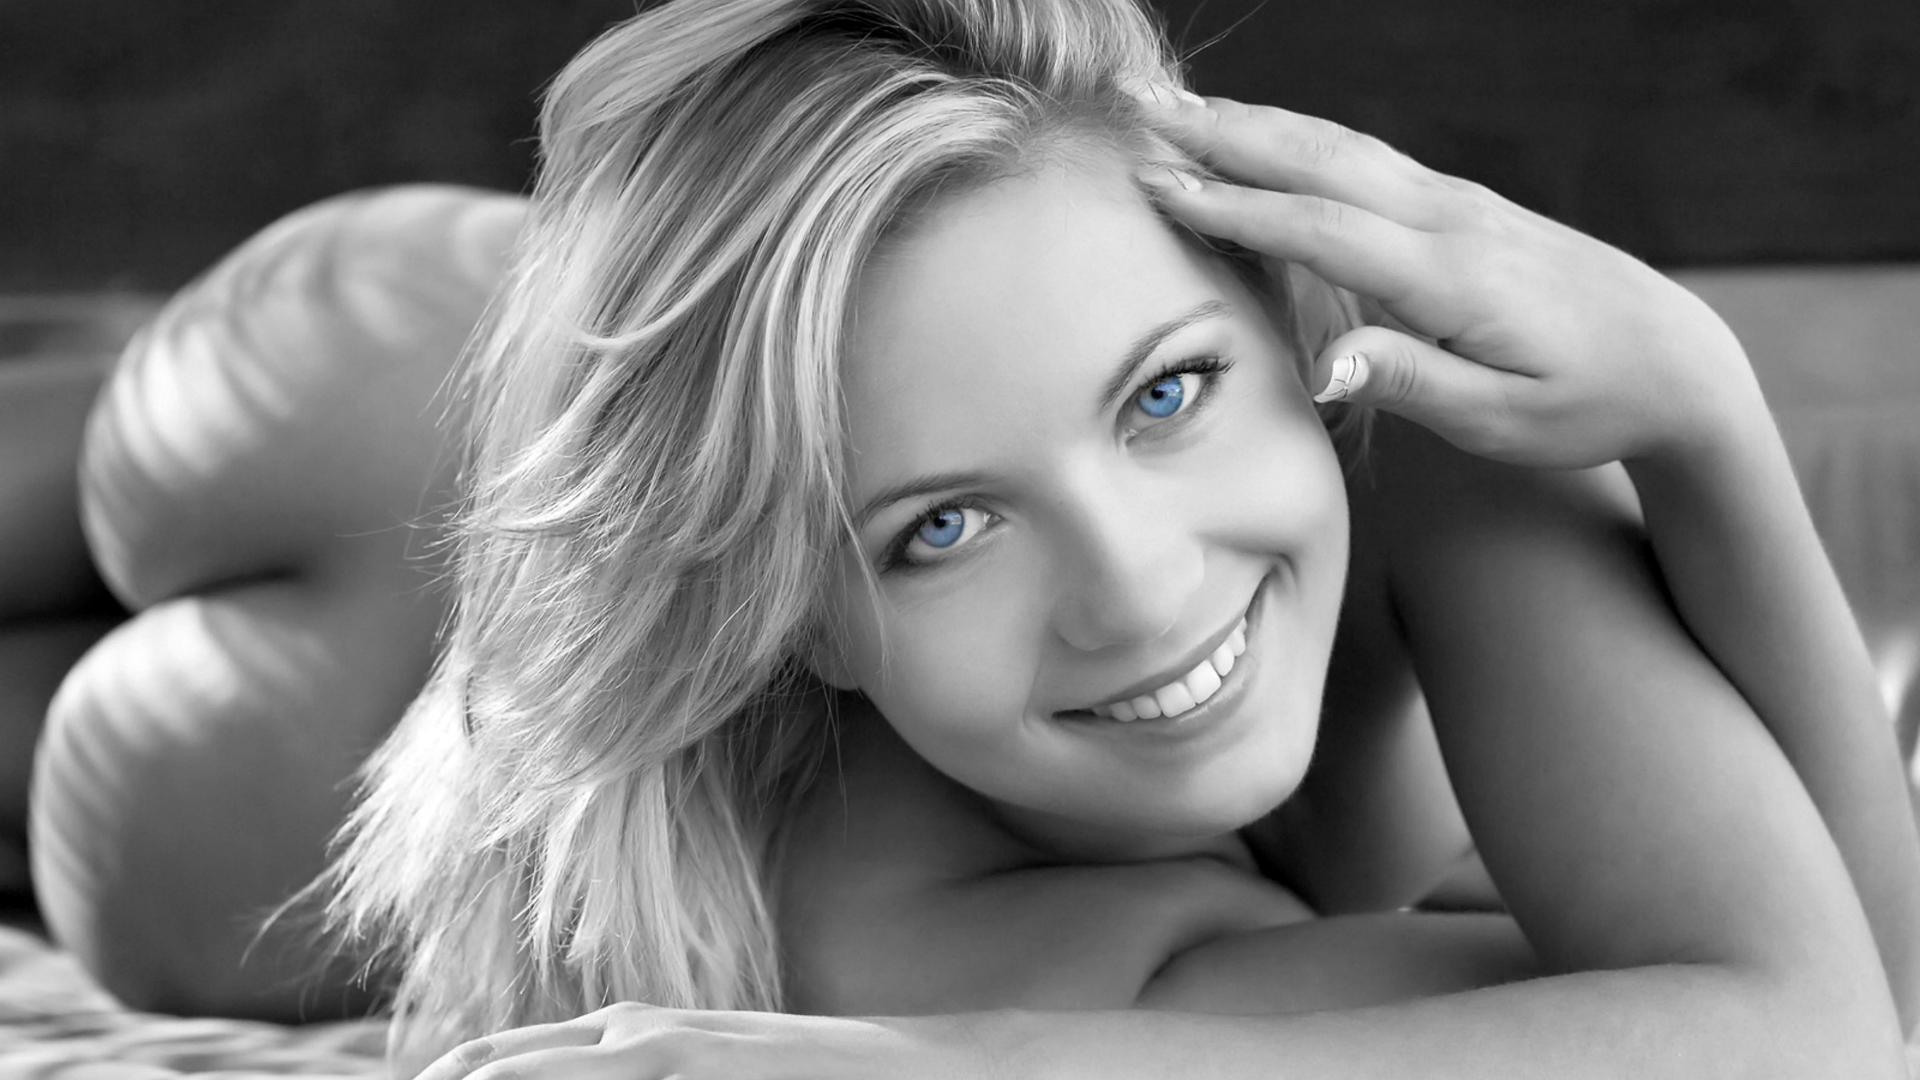 Download photo 1920x1080, jenni gregg, blonde, blue eyes